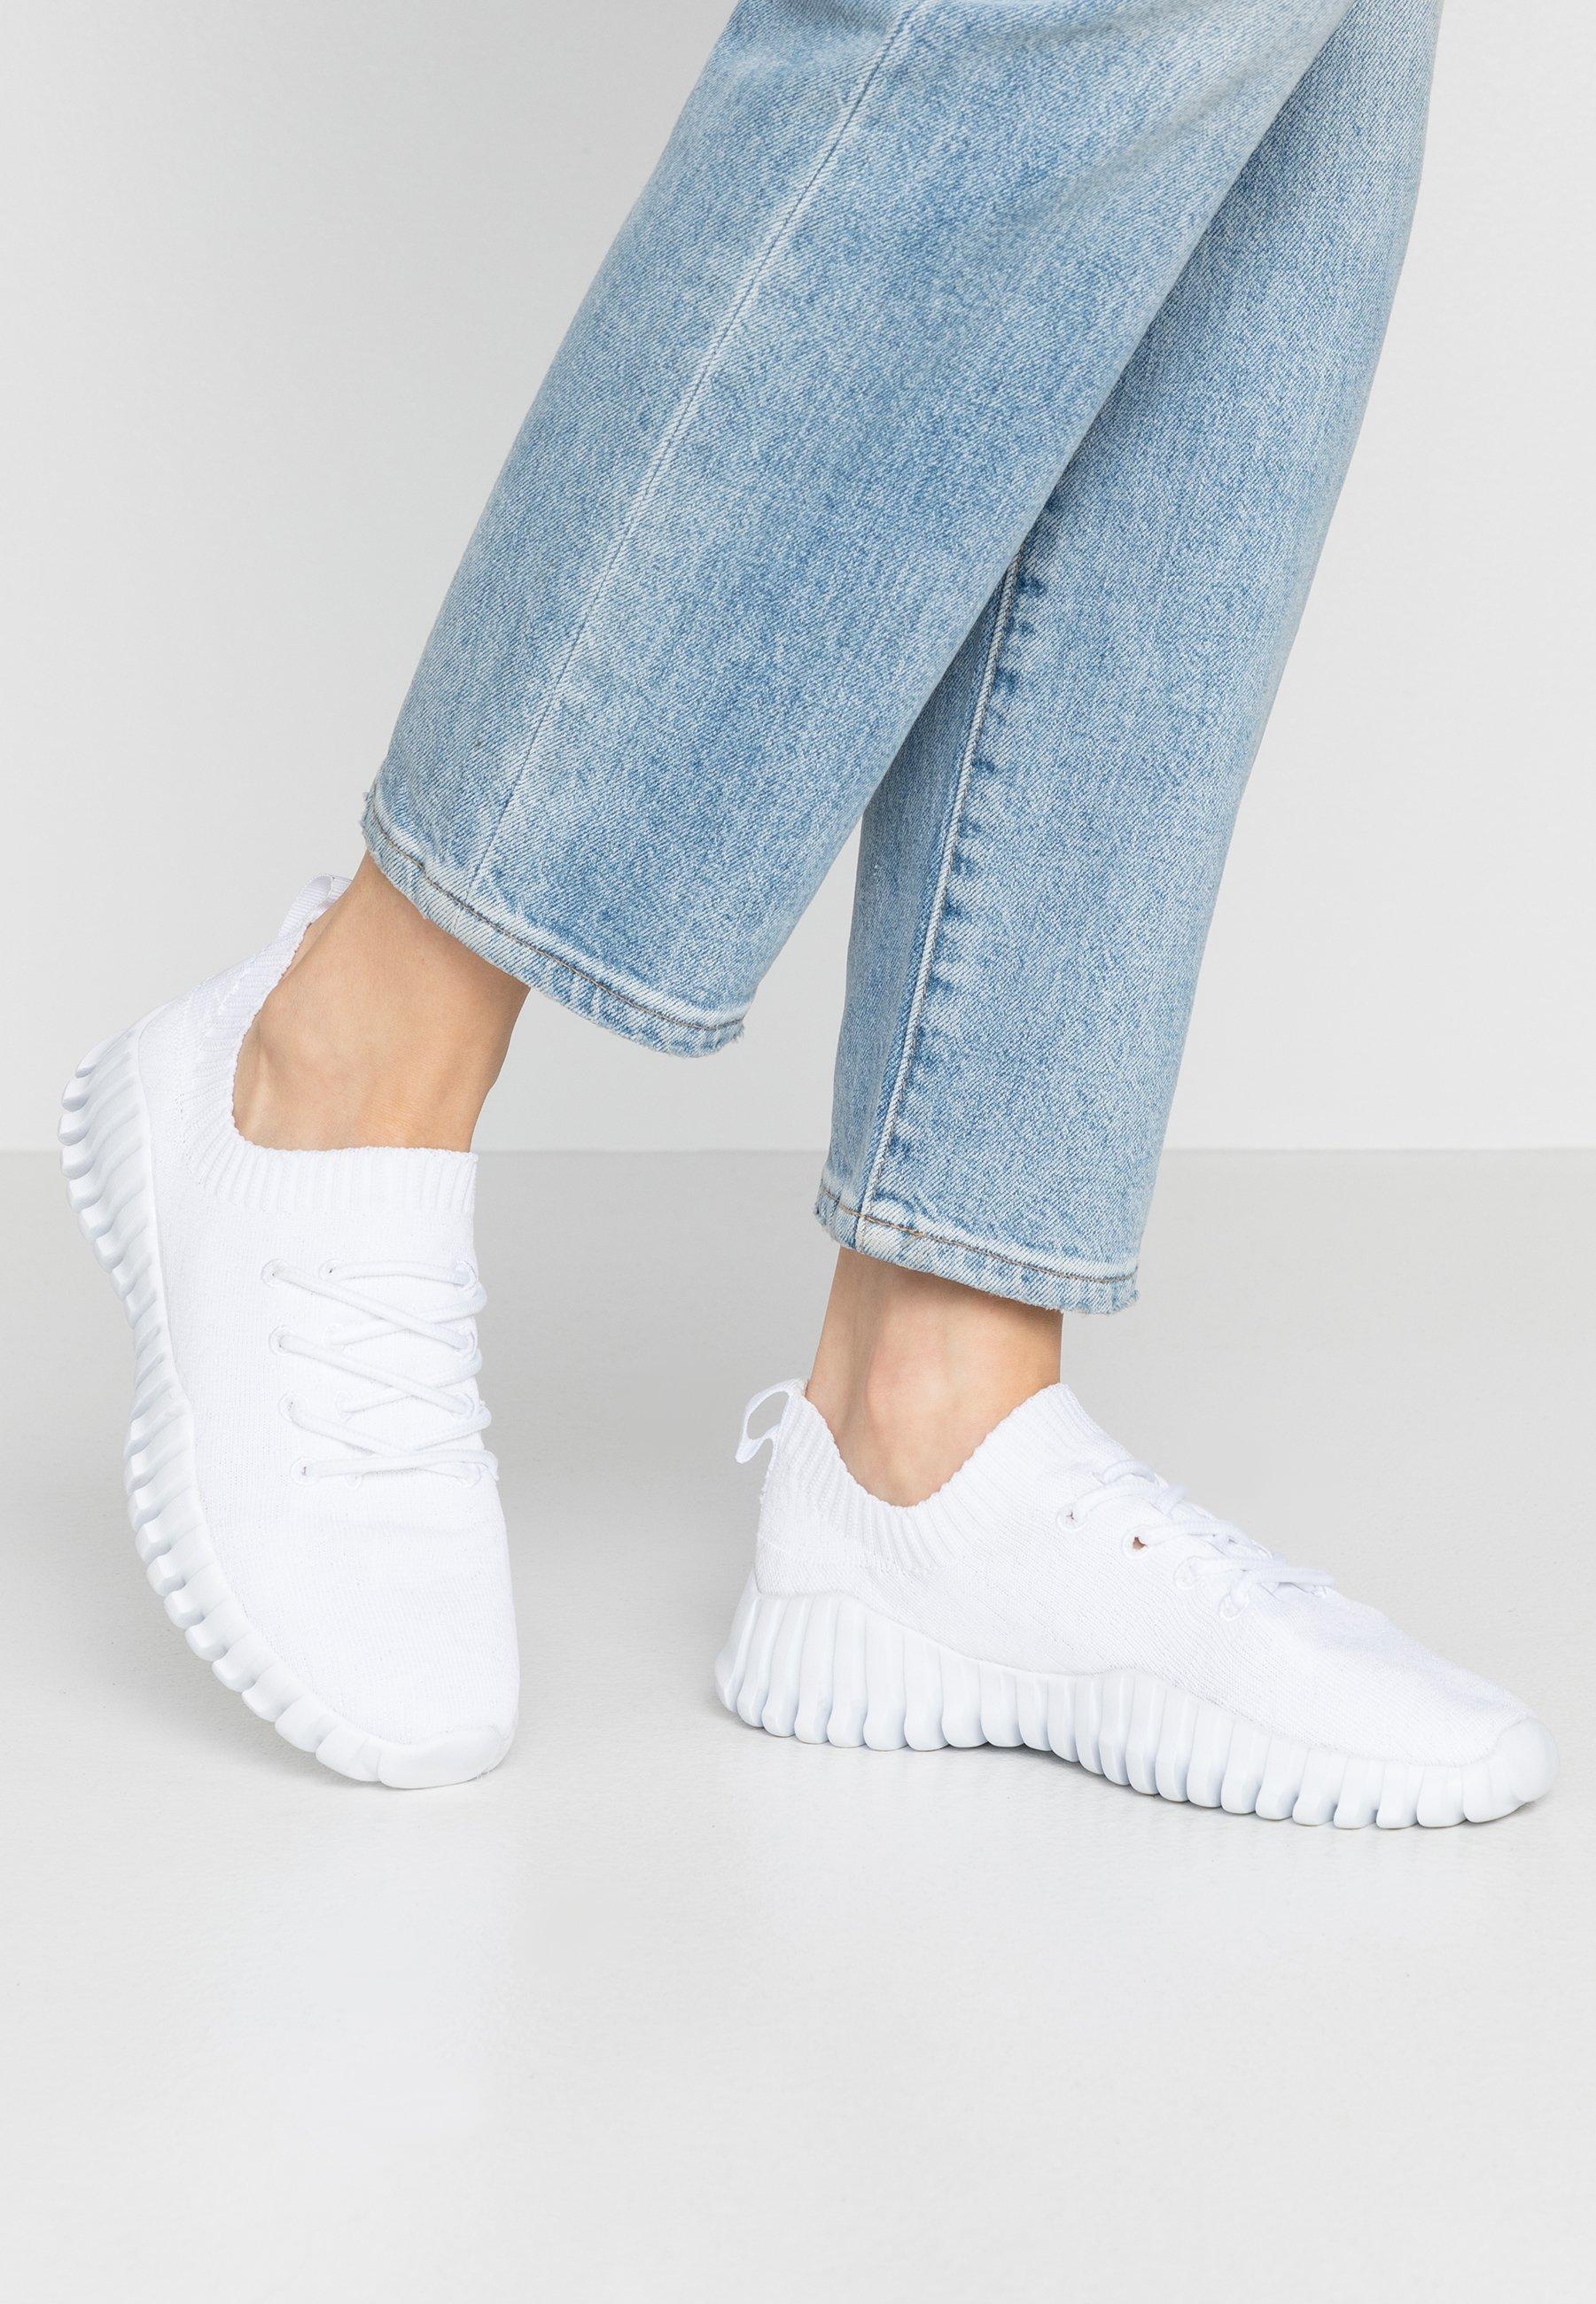 Bernie Mev Damskor | Köp dina skor online på Zalando.se